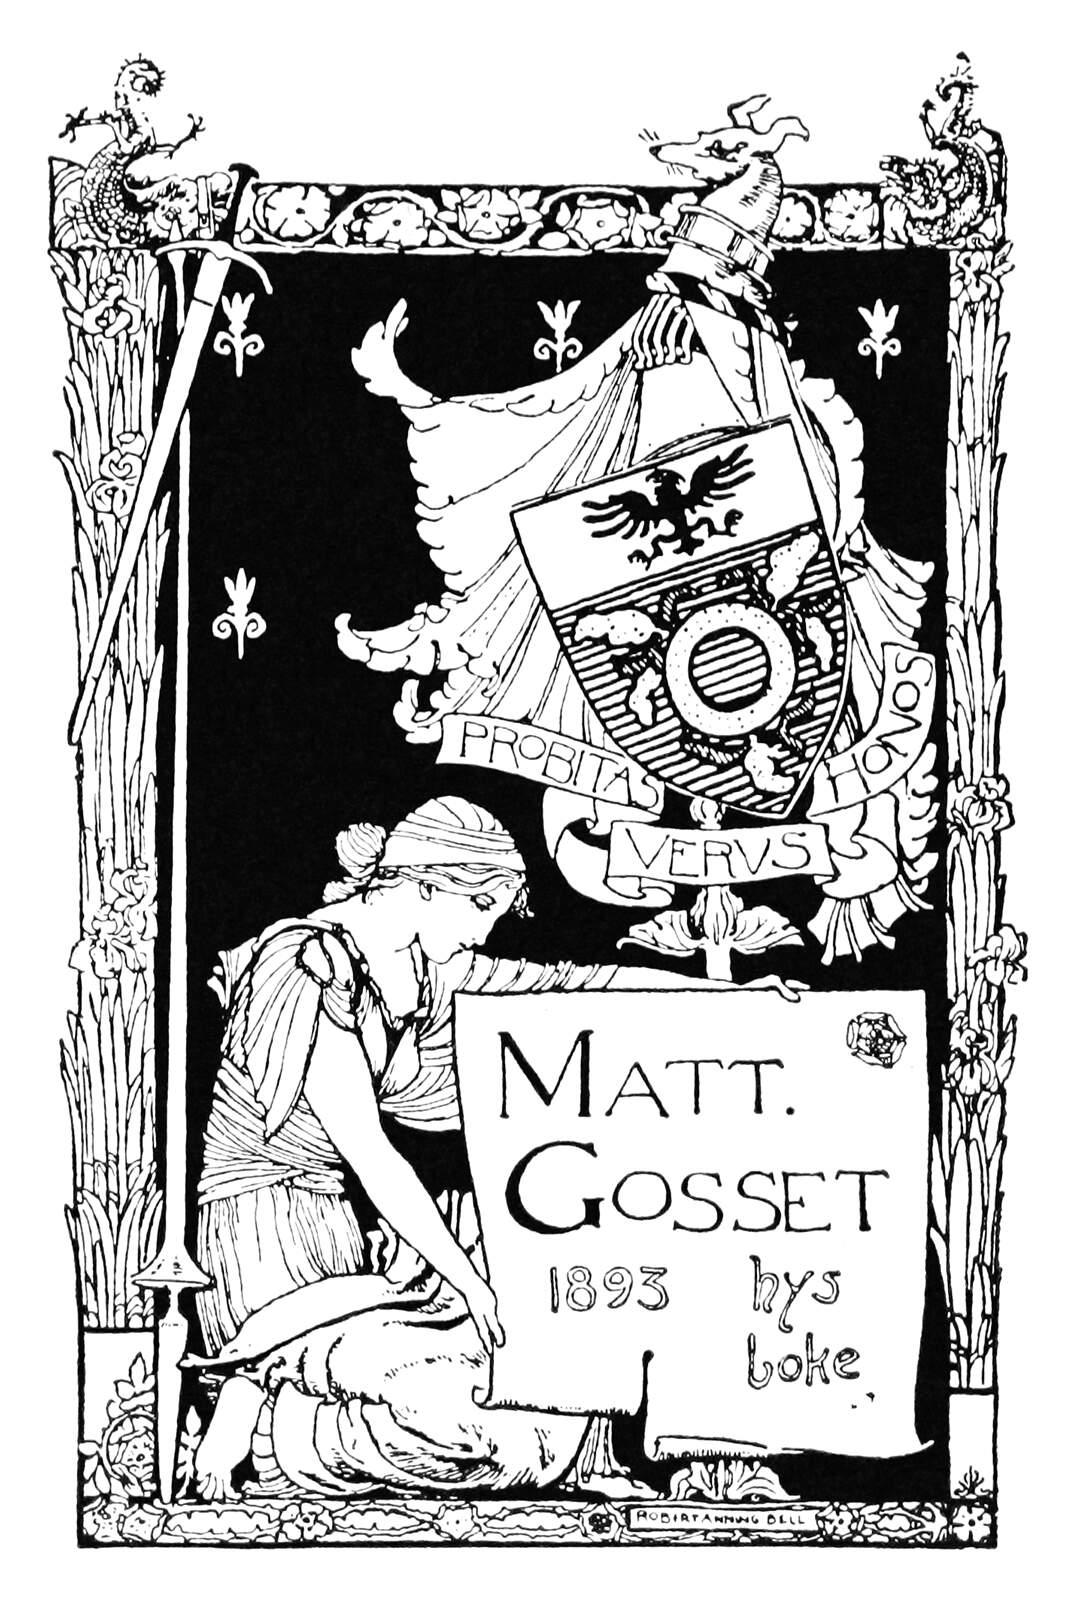 gosset-bookplate-1600.jpg (1068×1600)